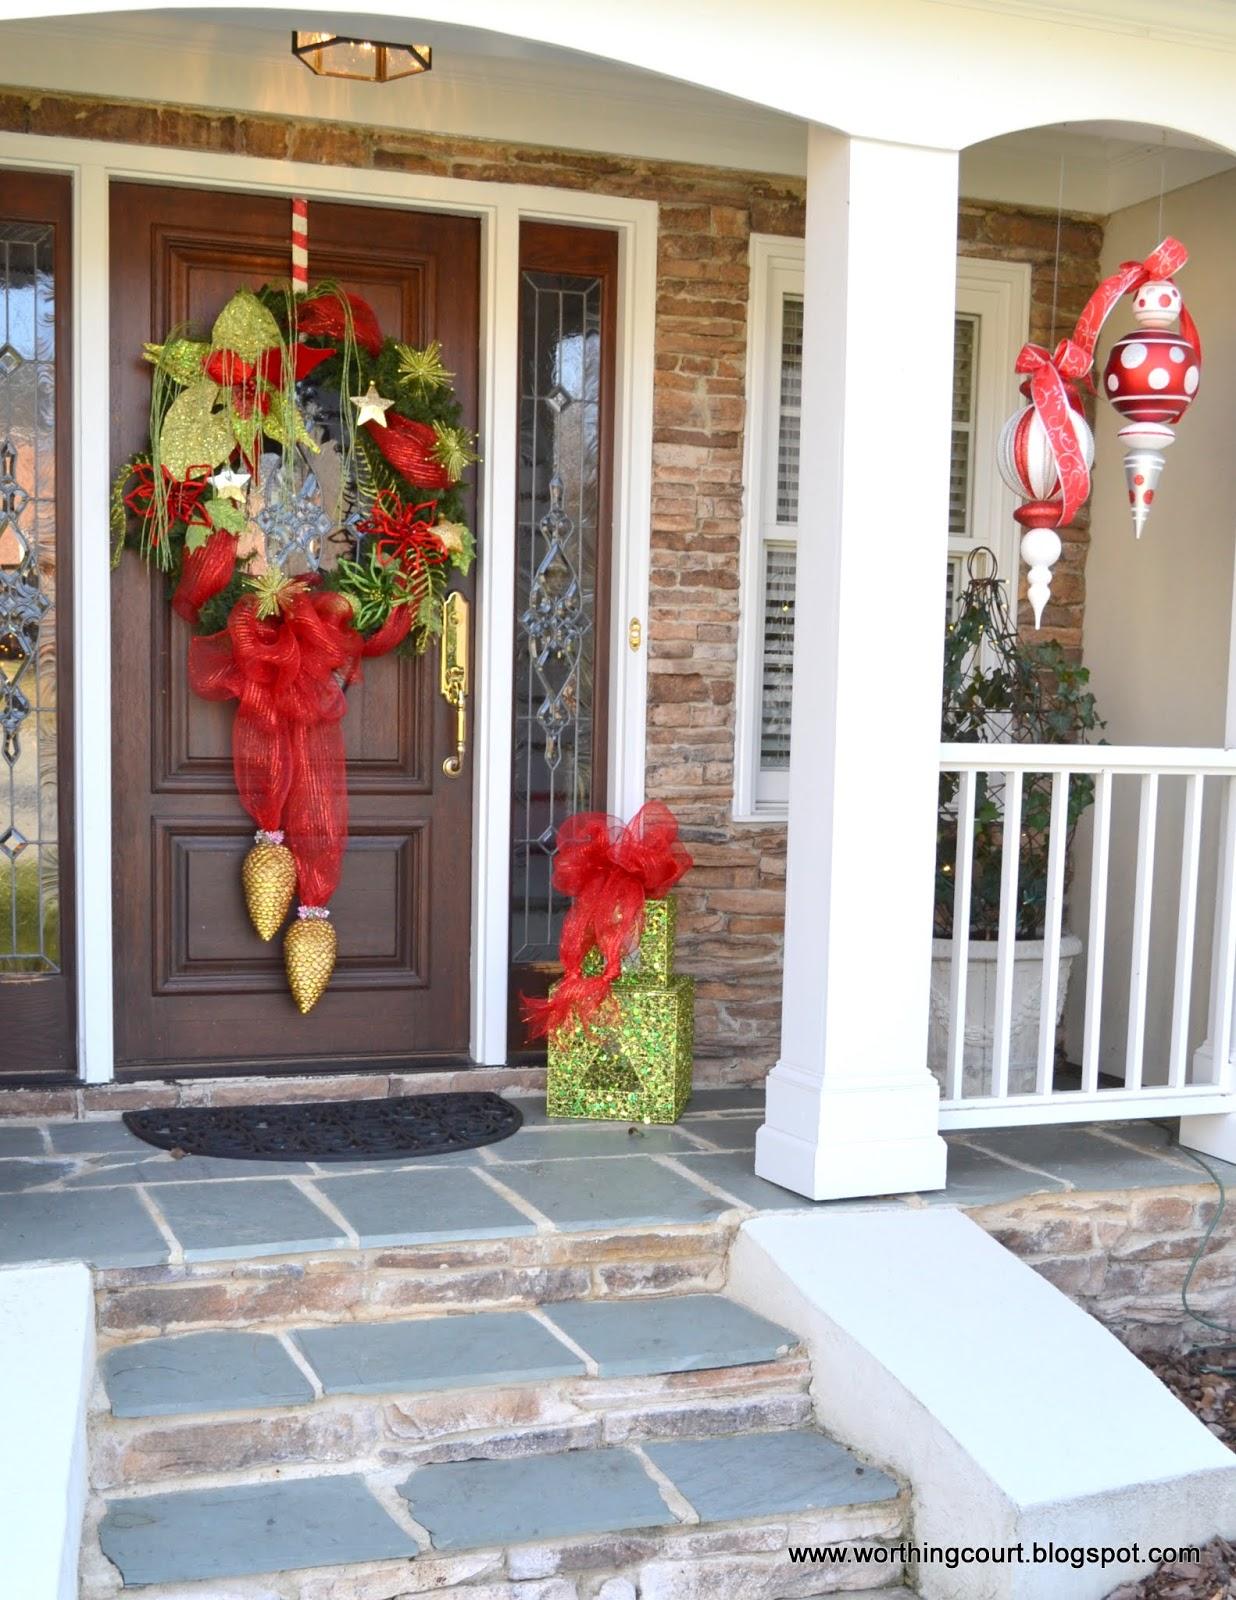 Christmas tour at nancy 39 s worthing court - Christmas exterior decoration ideas ...